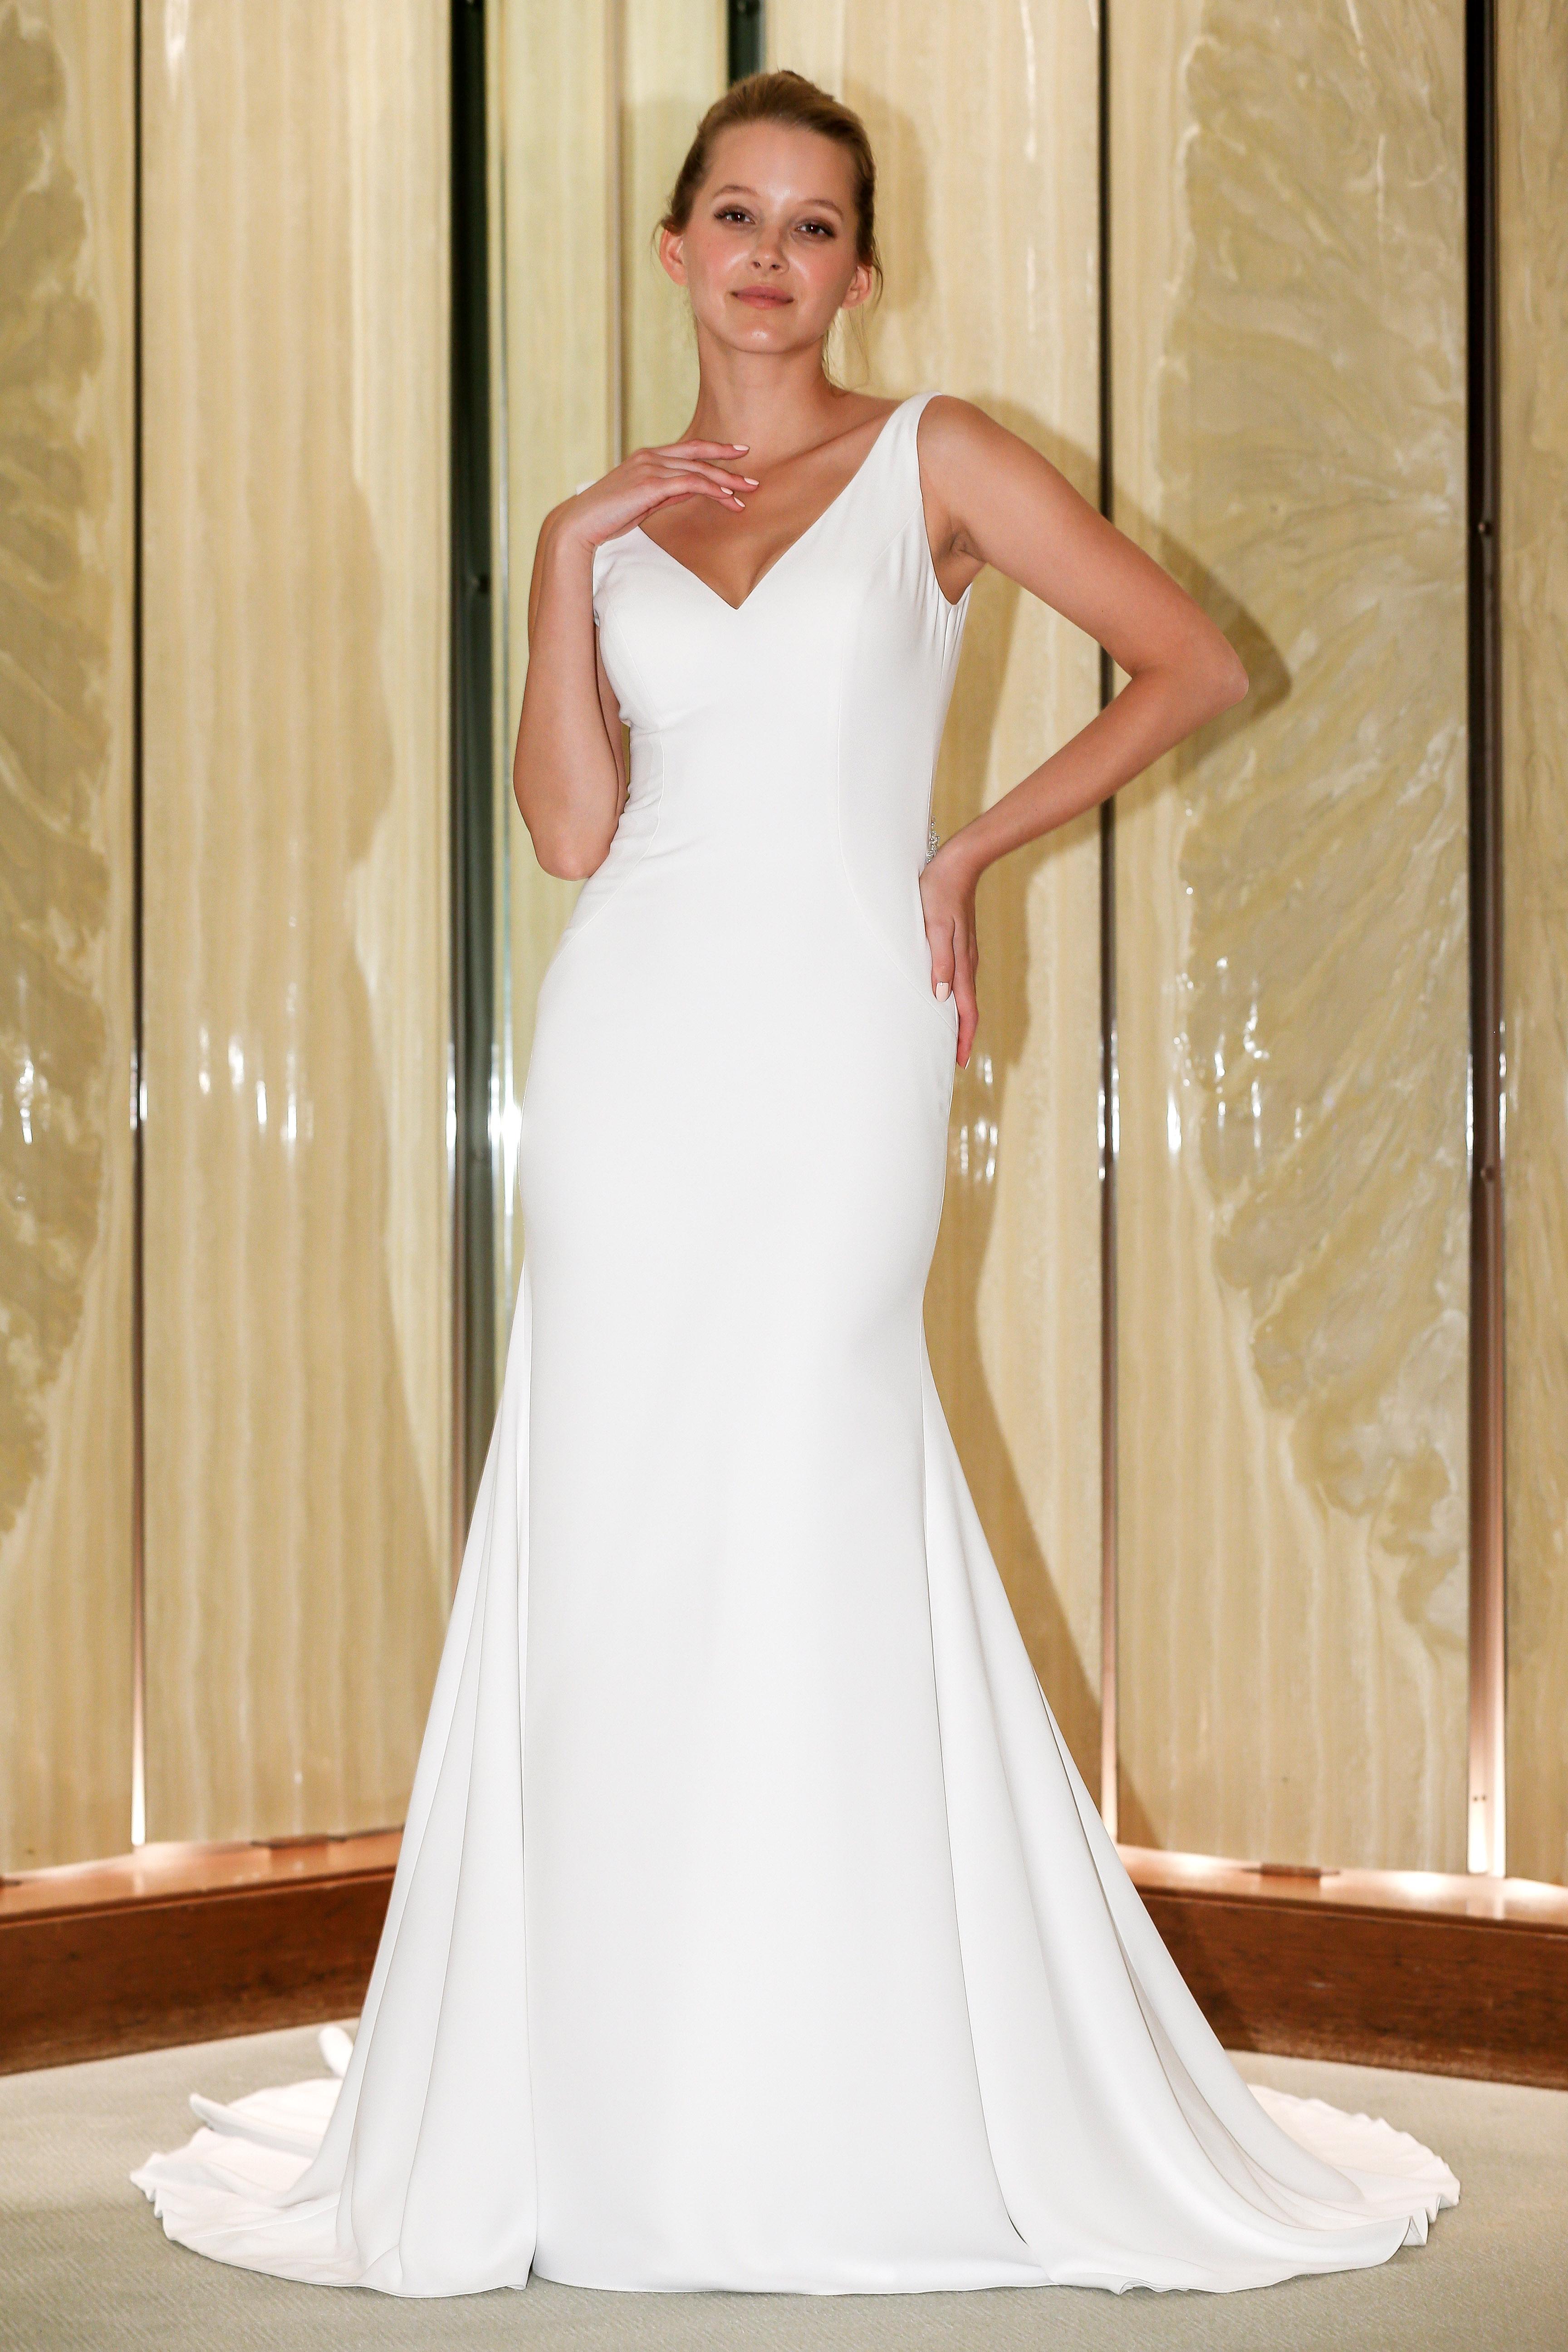 randy fenoli wedding dress sleeveless v-neck sheath with train